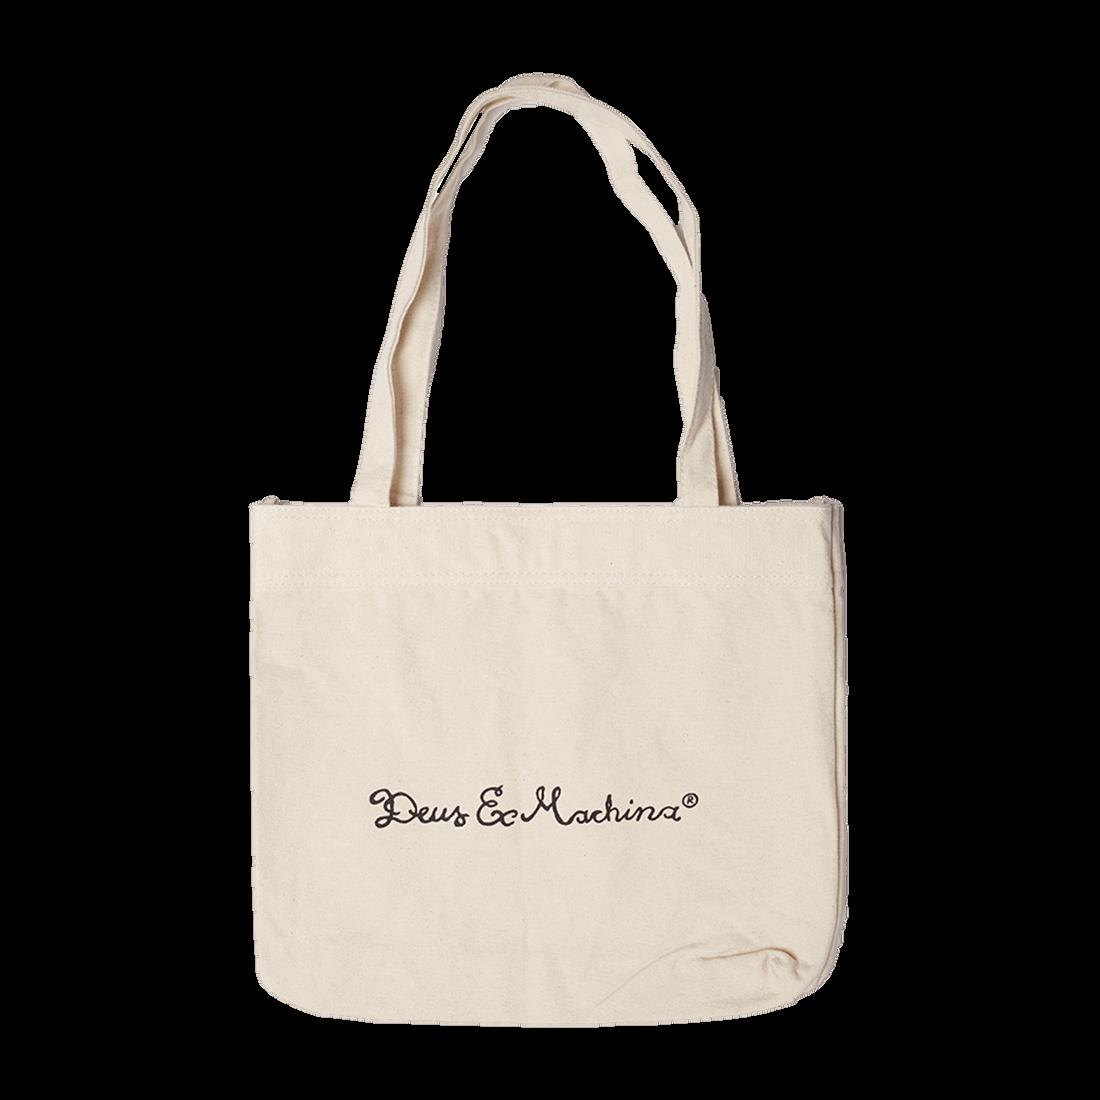 Deus Tote Bag - Canvas White